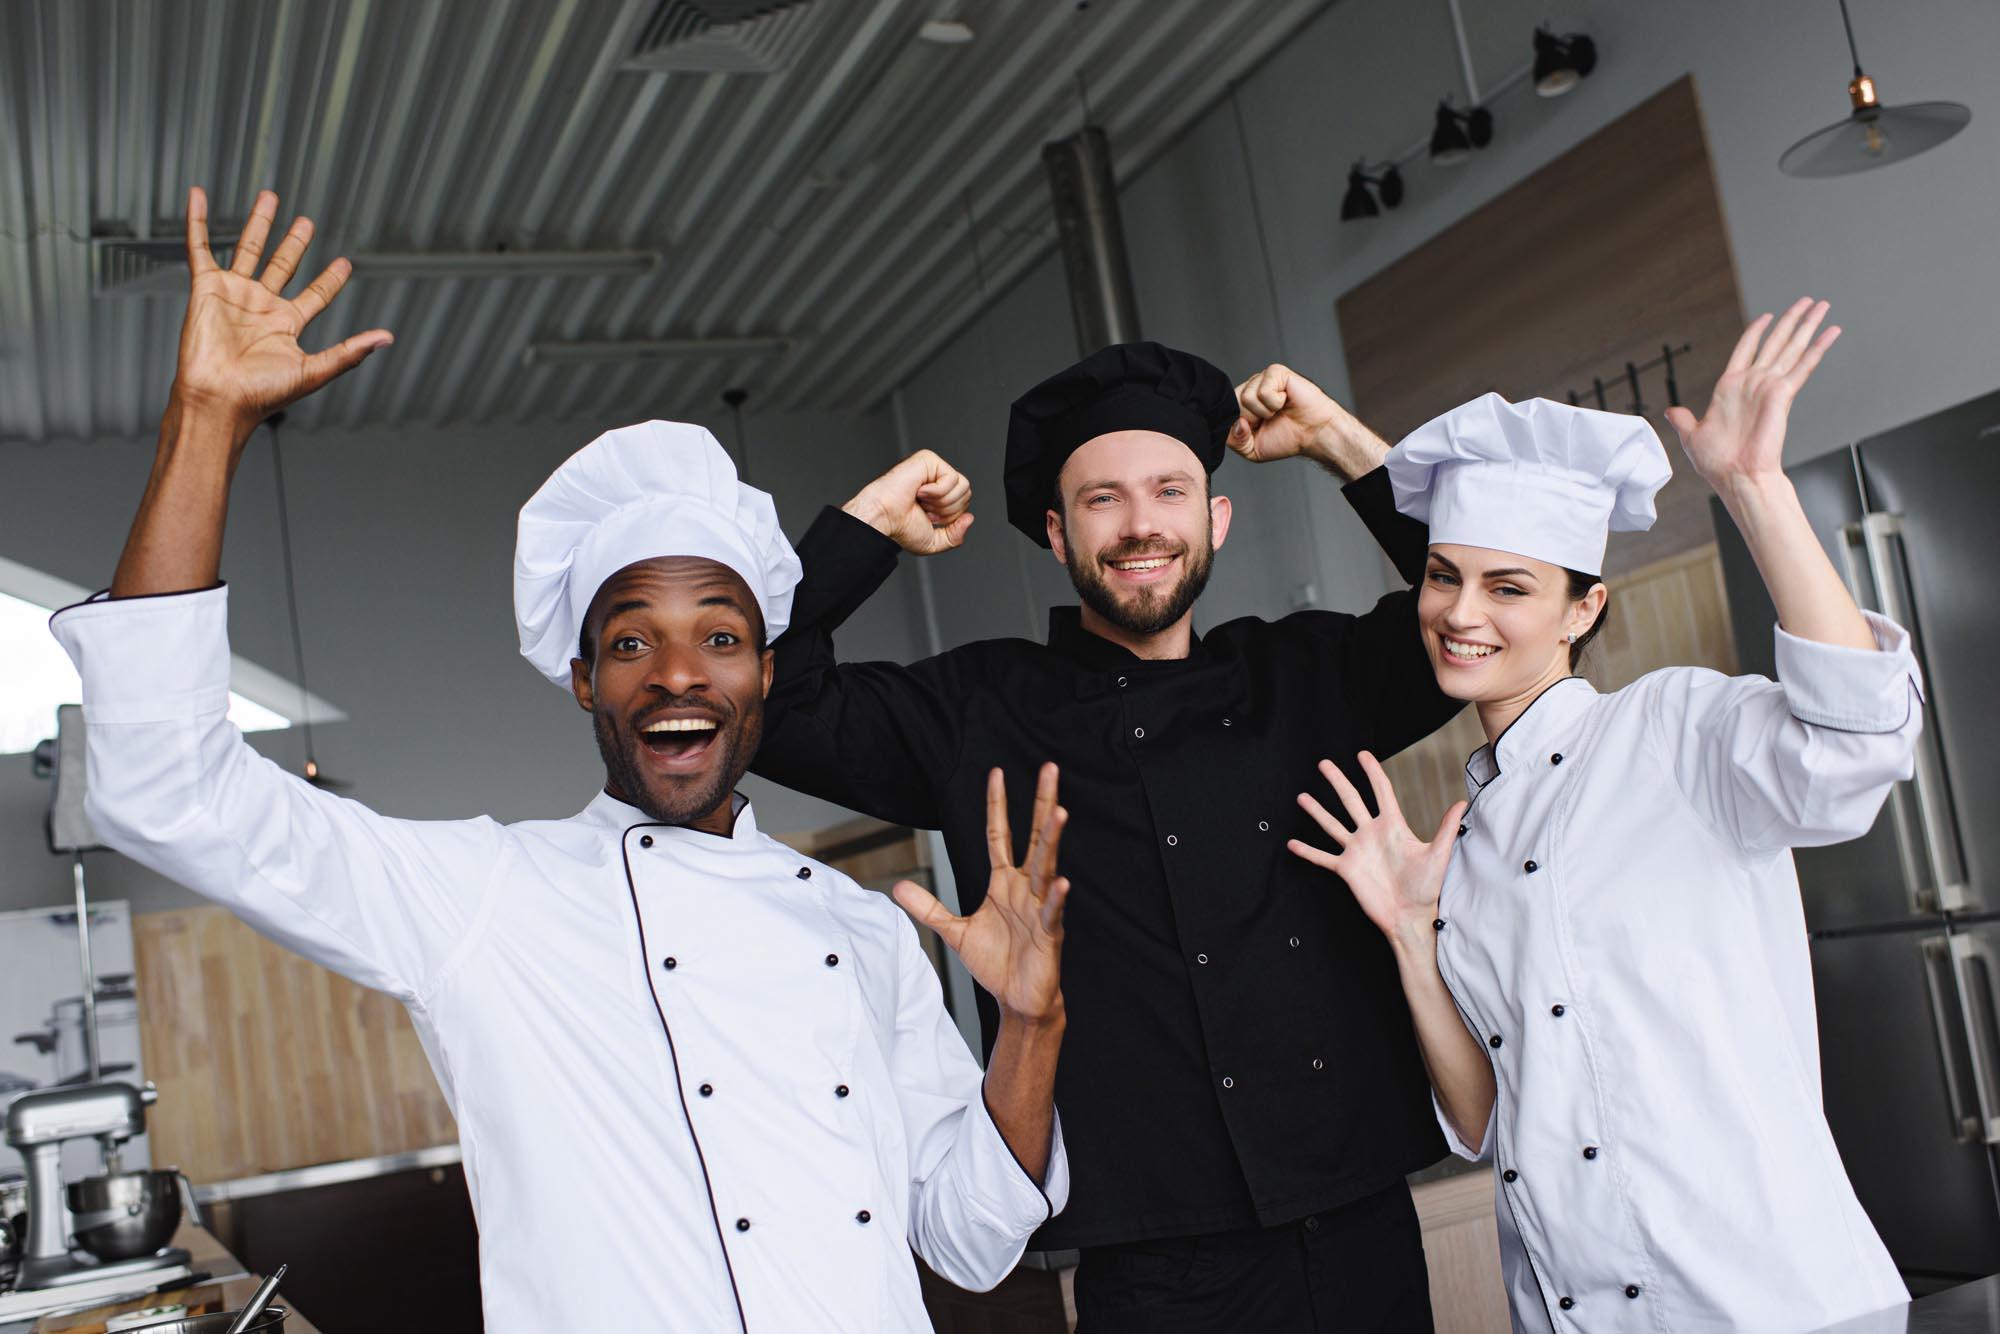 Instant Gratification with Restaurant Training